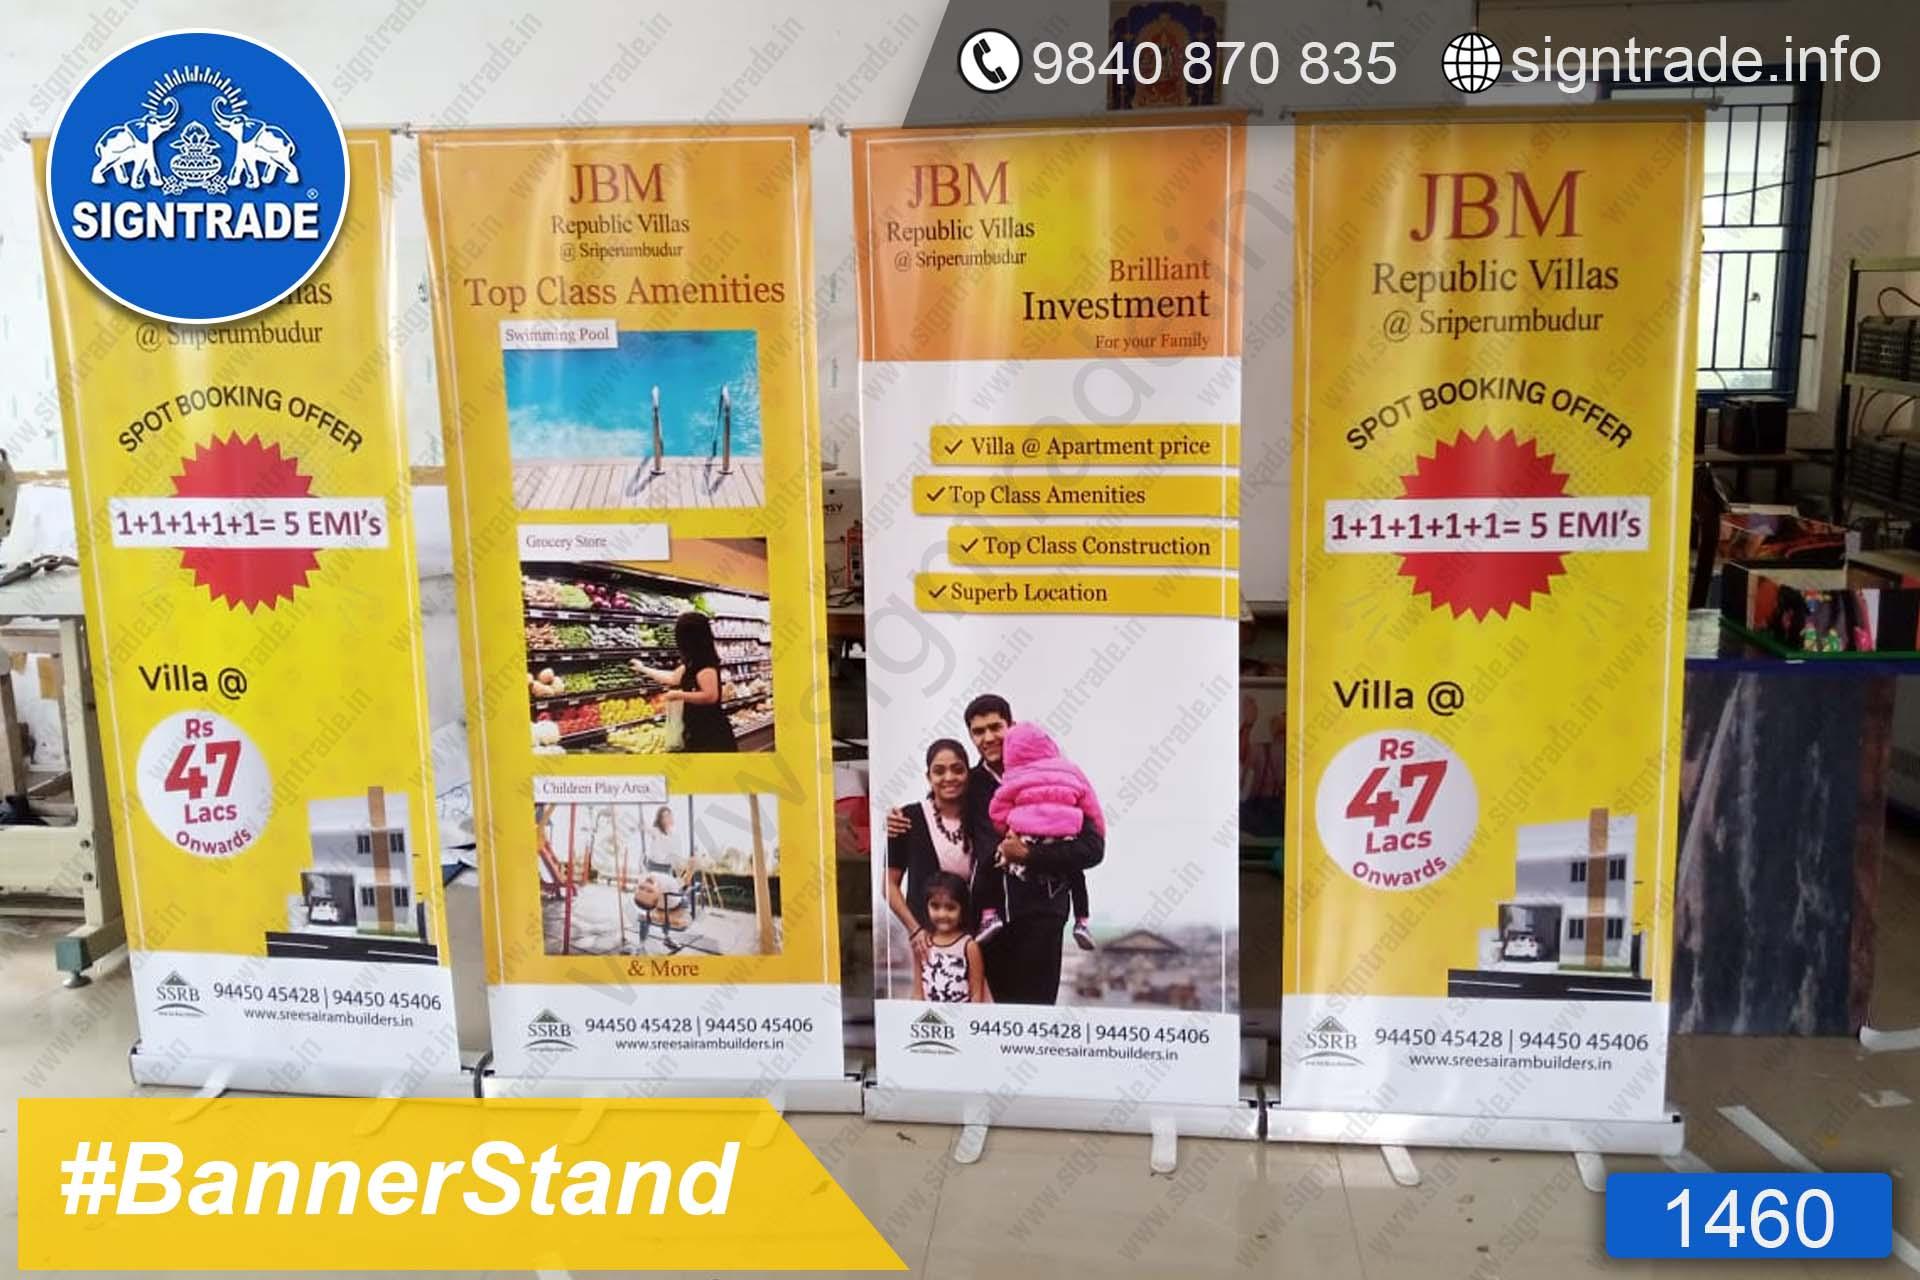 JBM Republic Villas - 1460 - Retractable Banner, Roll Up Banner Stand, Banner Stand, Roll Up Banner, Standee, Promotional Standee, Promotional Roll Up Standee, Promo Standee